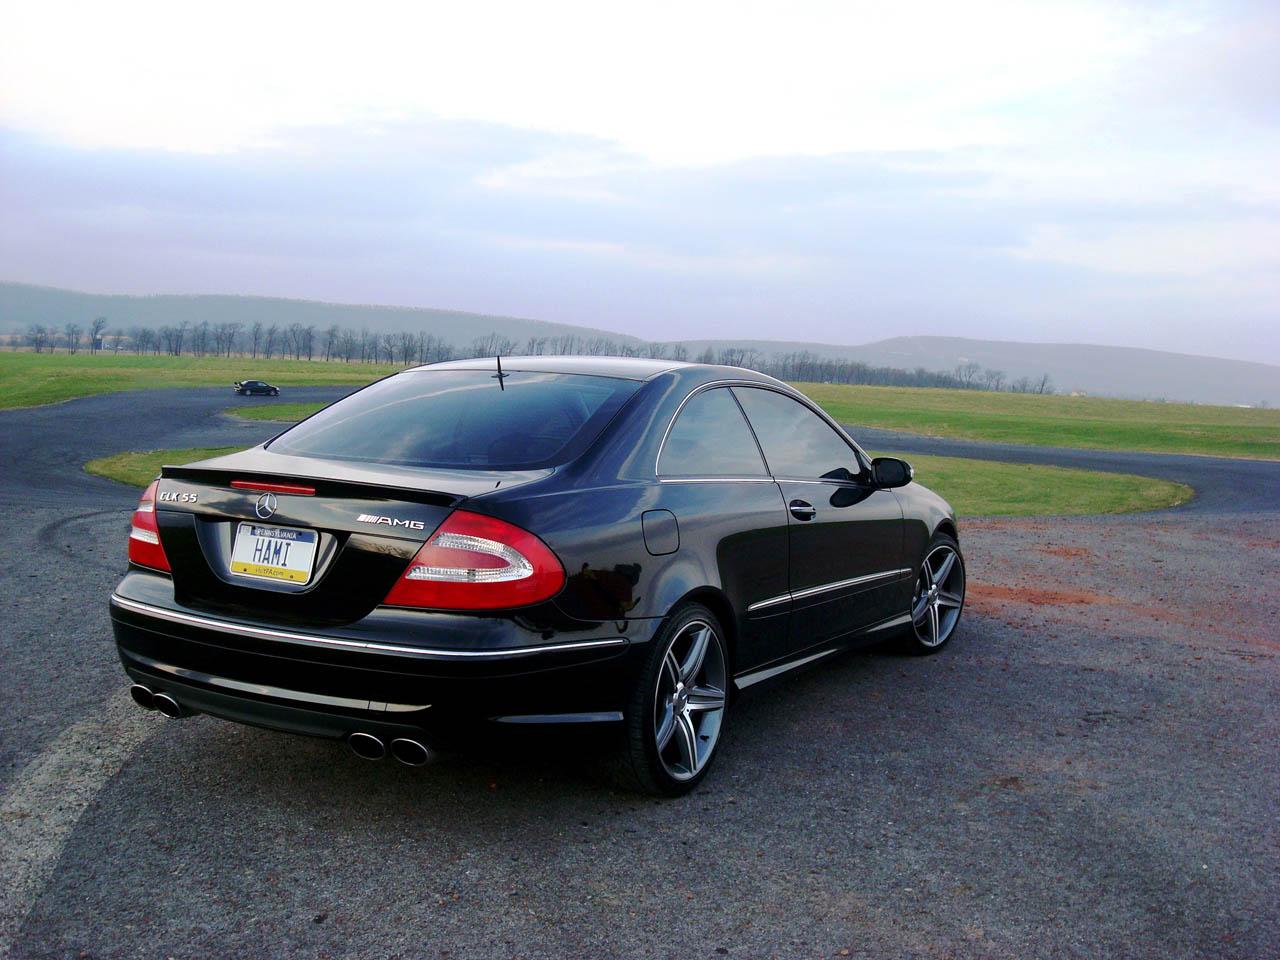 1 4 Mile Times >> 2005 Mercedes-Benz CLK55 AMG 1/4 mile trap speeds 0-60 - DragTimes.com